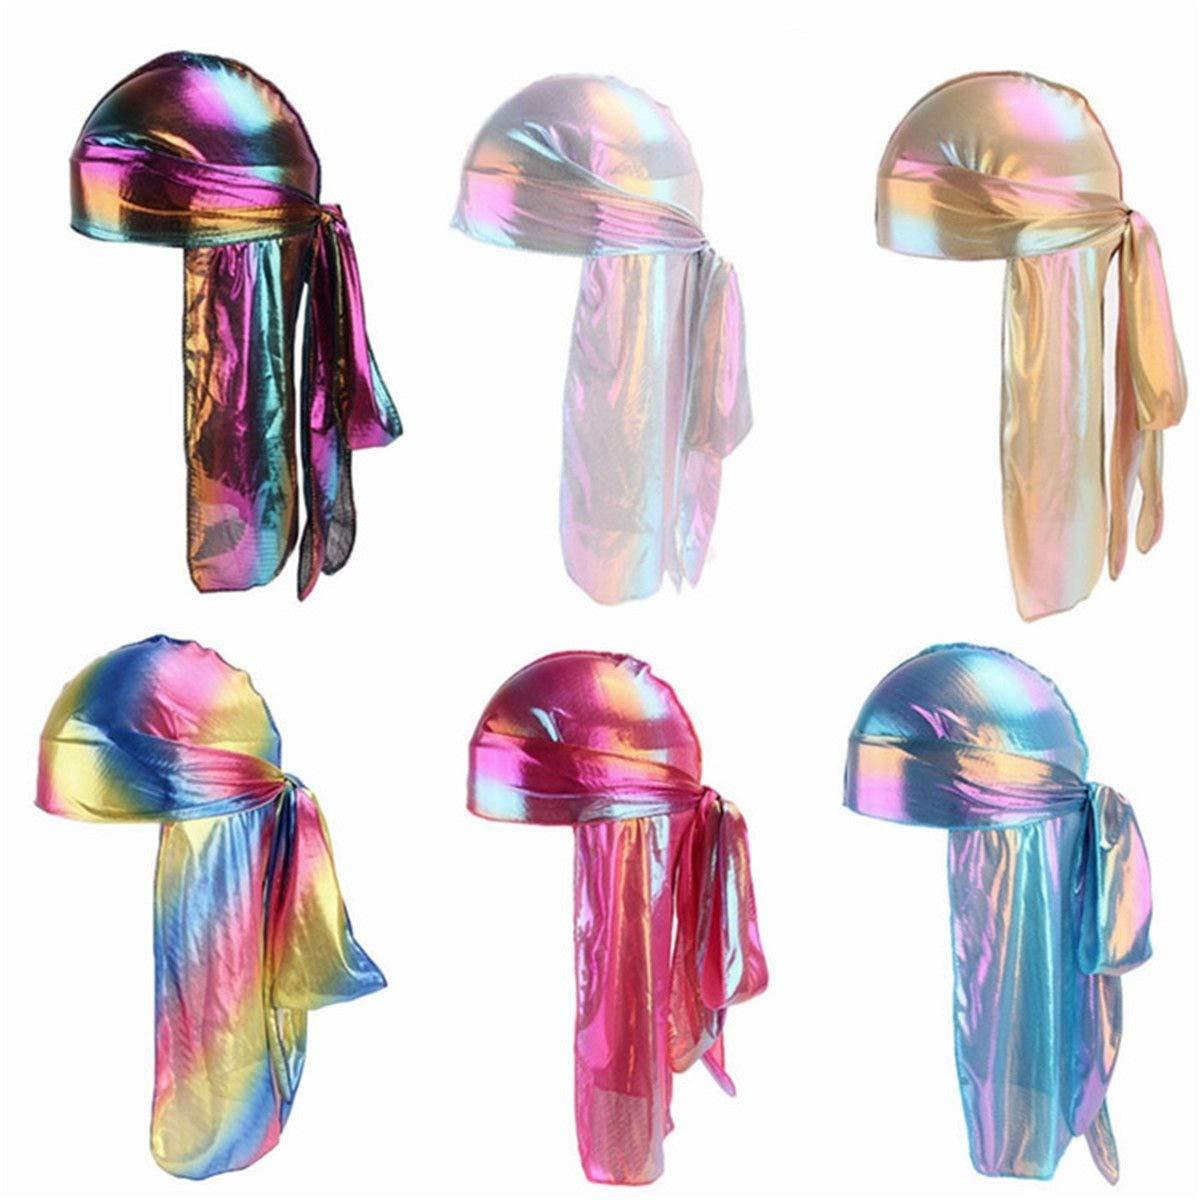 Inverlee Men/Women Silk Polyester Bandana Hat Durag Rag Tail Headwrap Headwear Gift by Inverlee (Image #2)